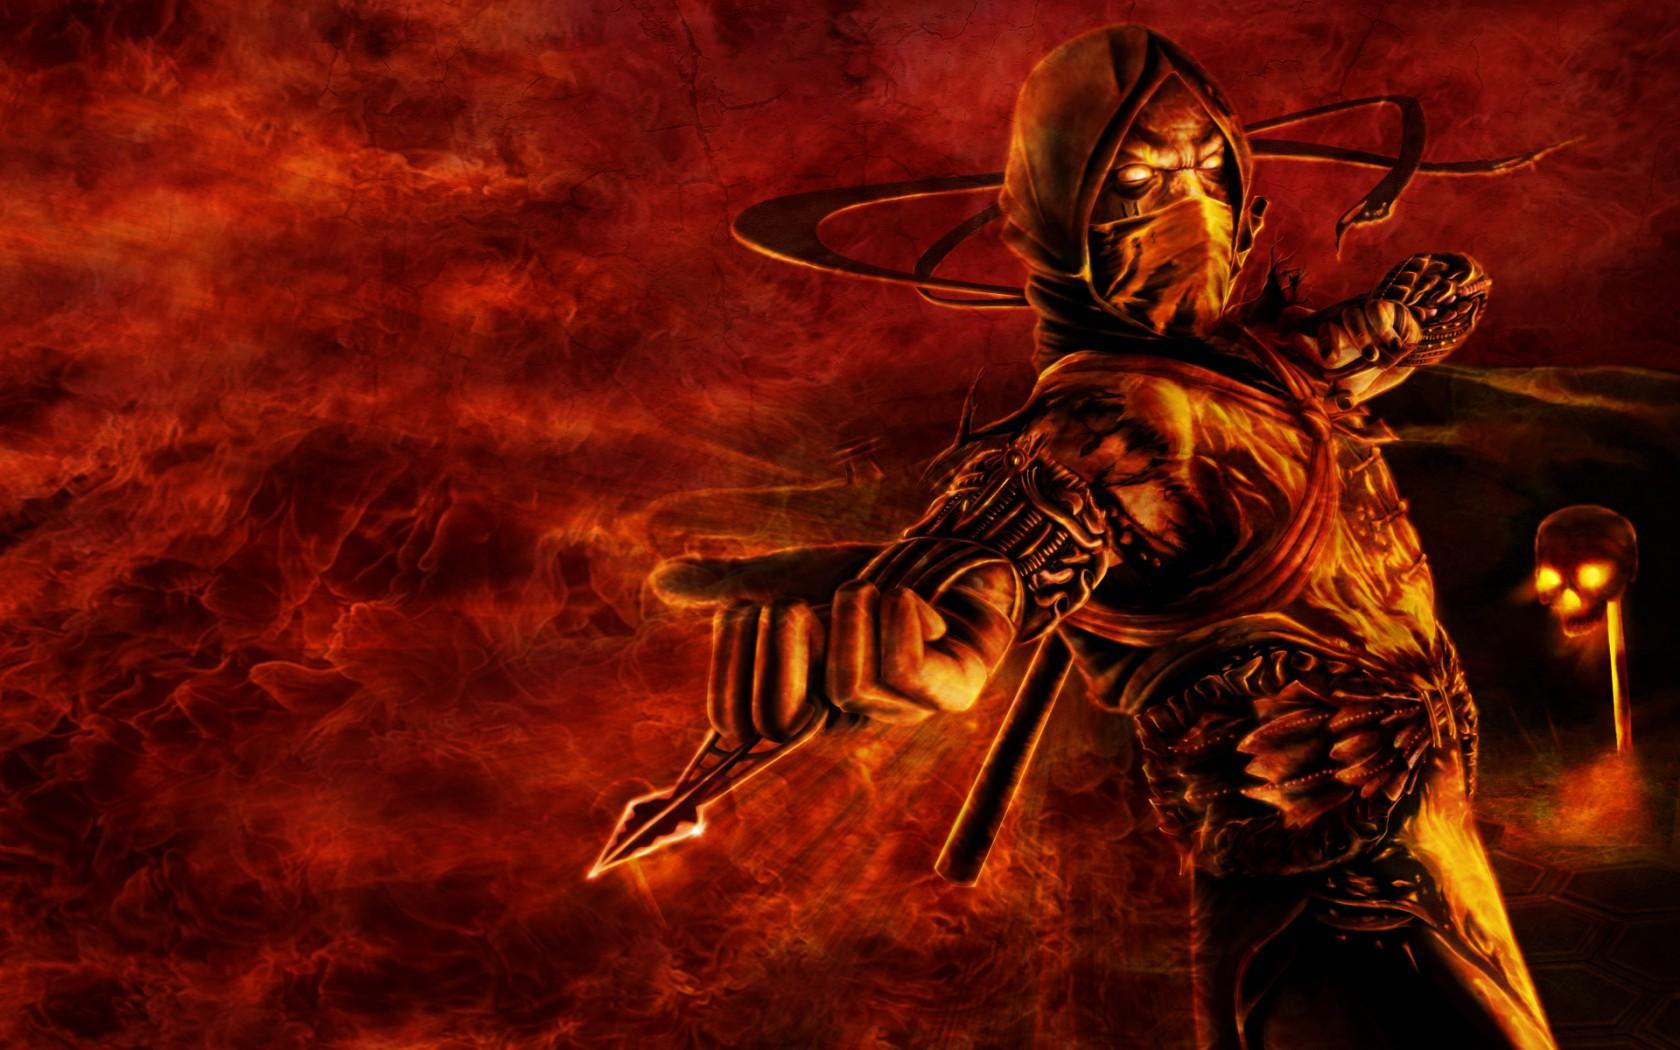 Scorpion Mortal Kombat Wallpaper Picture 1680x1050